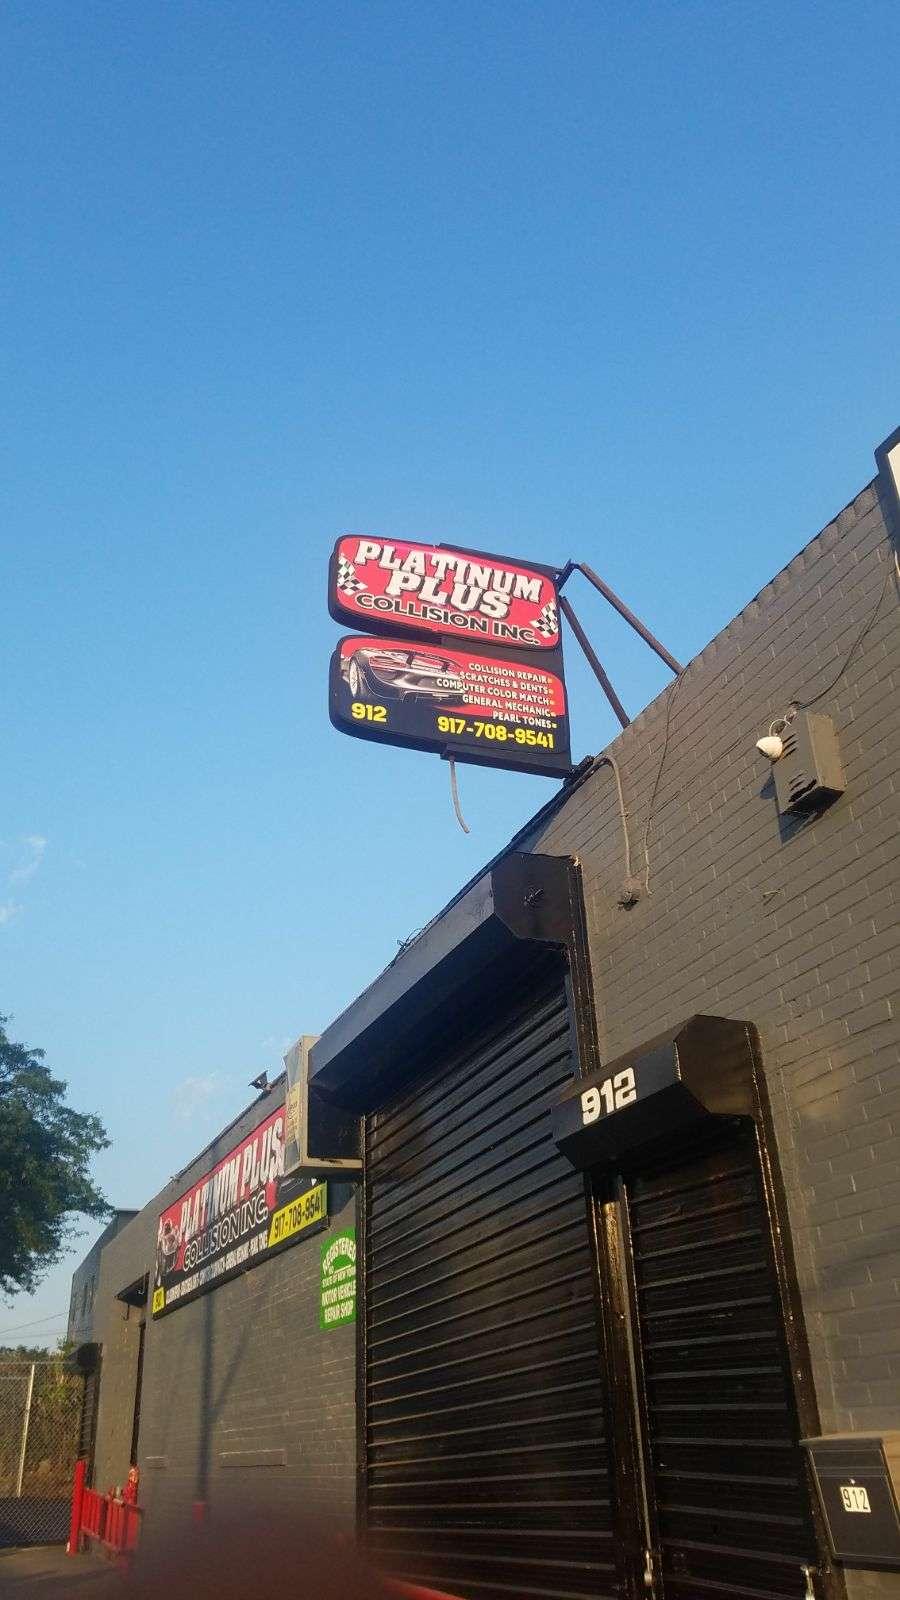 Platinum Plus Collision Inc - car repair  | Photo 3 of 7 | Address: 912 Sacket Ave, The Bronx, NY 10462, USA | Phone: (917) 708-9541